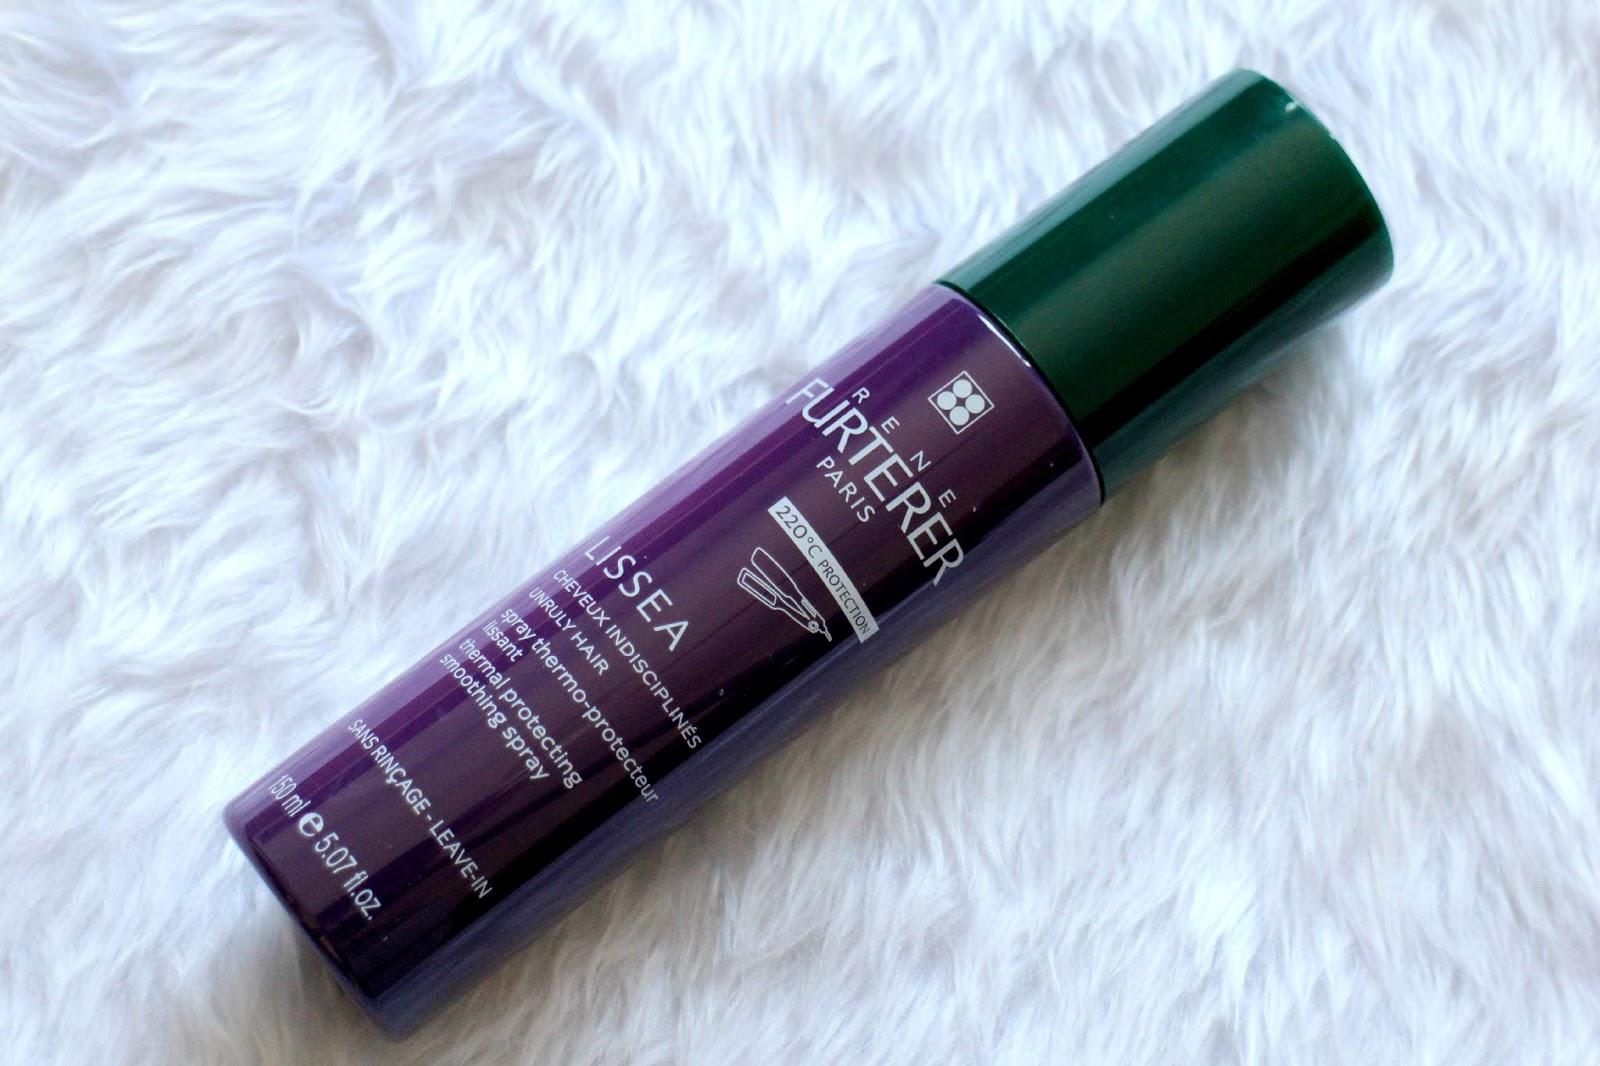 Rene Furterer Lissea Thermal Protecting Smoothing Spray